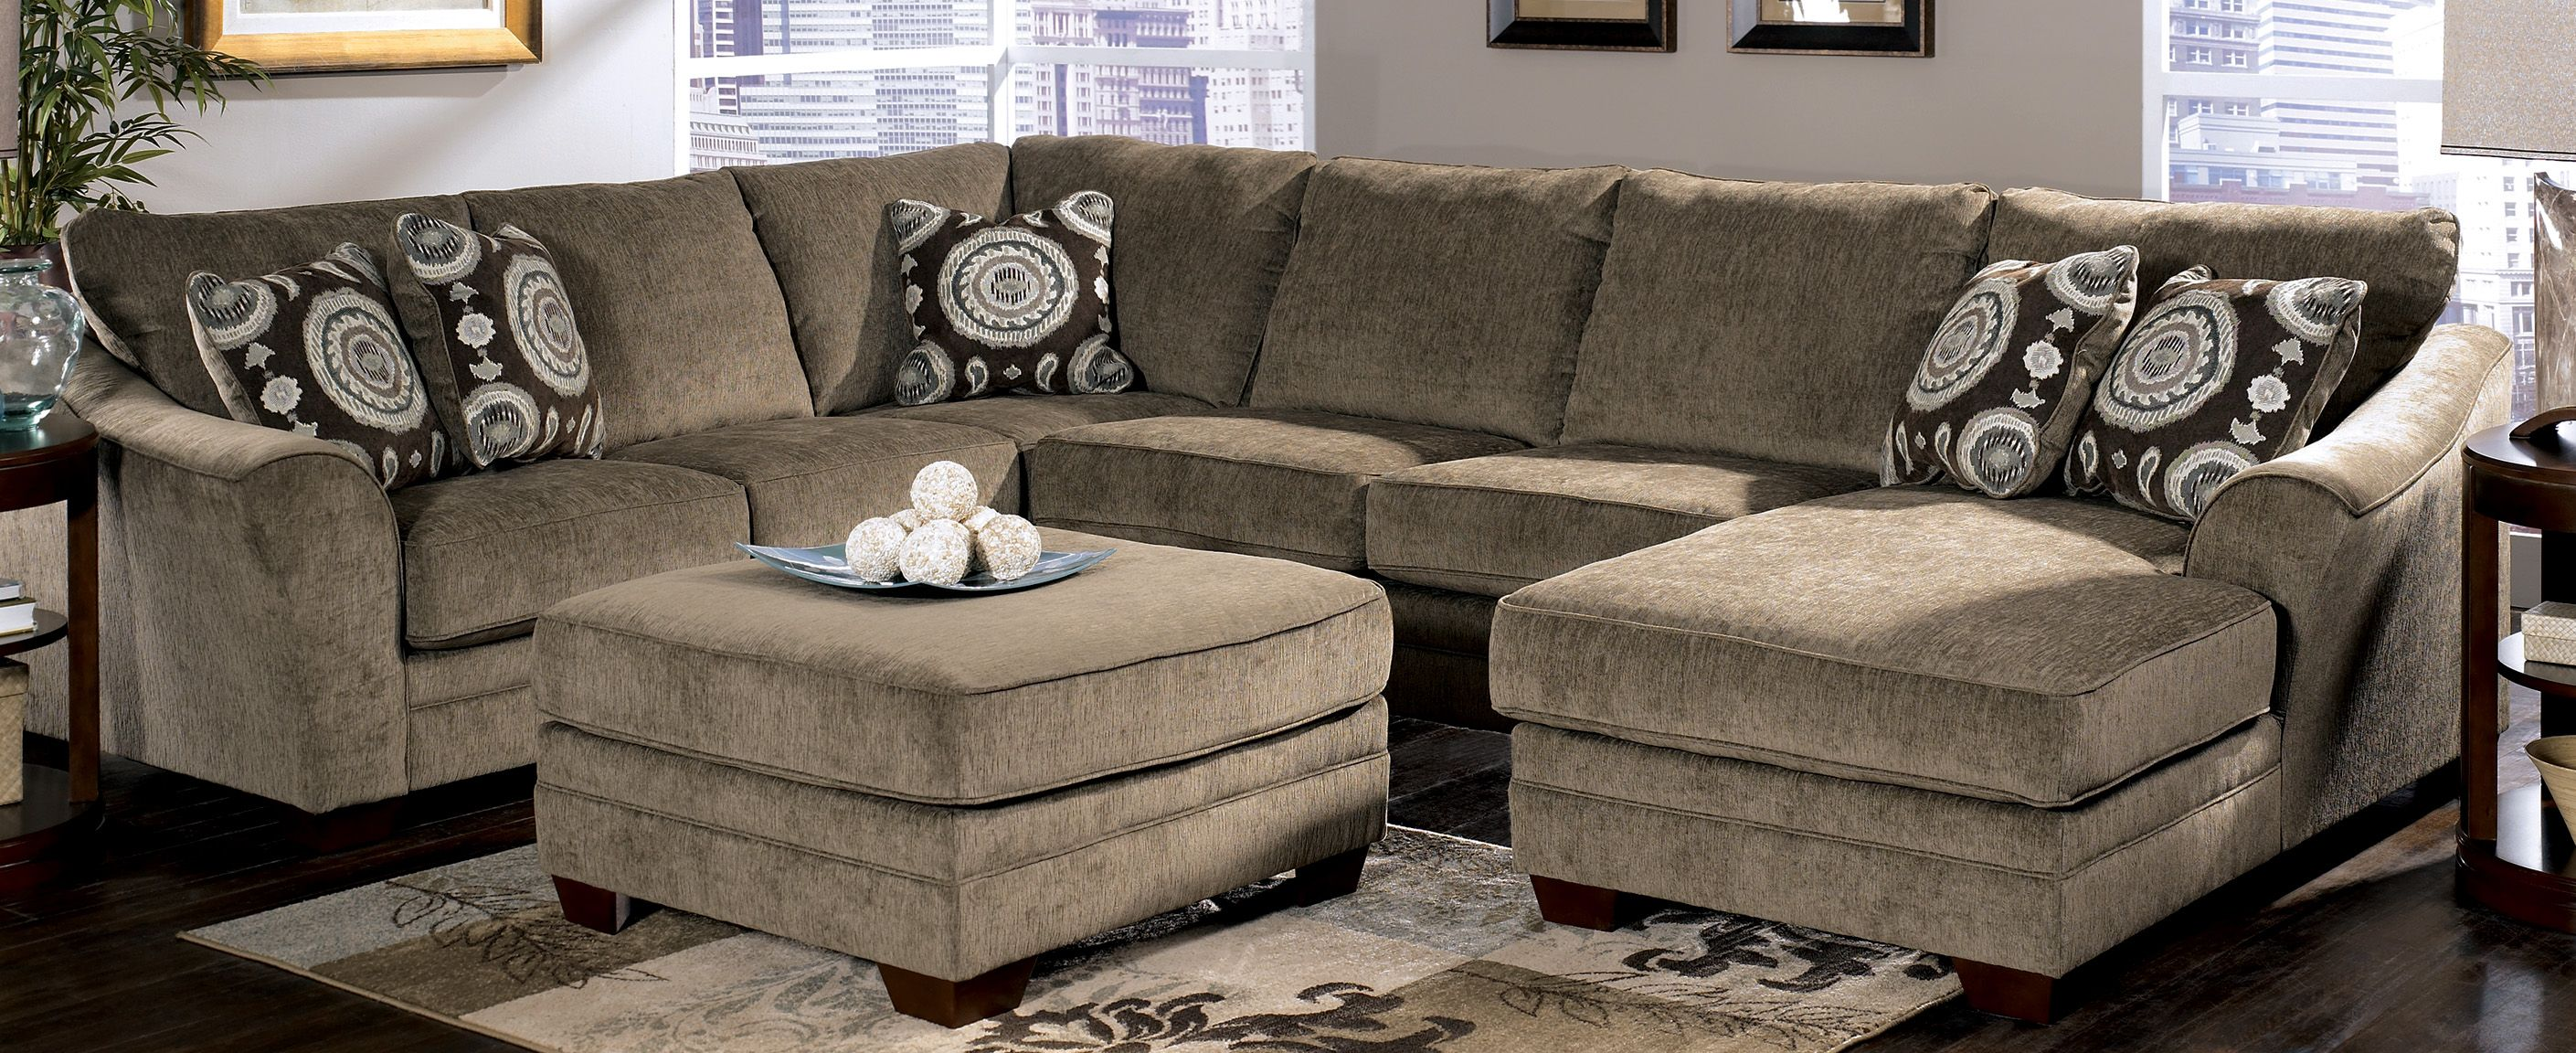 Discount Furniture Cincinnati Ohio